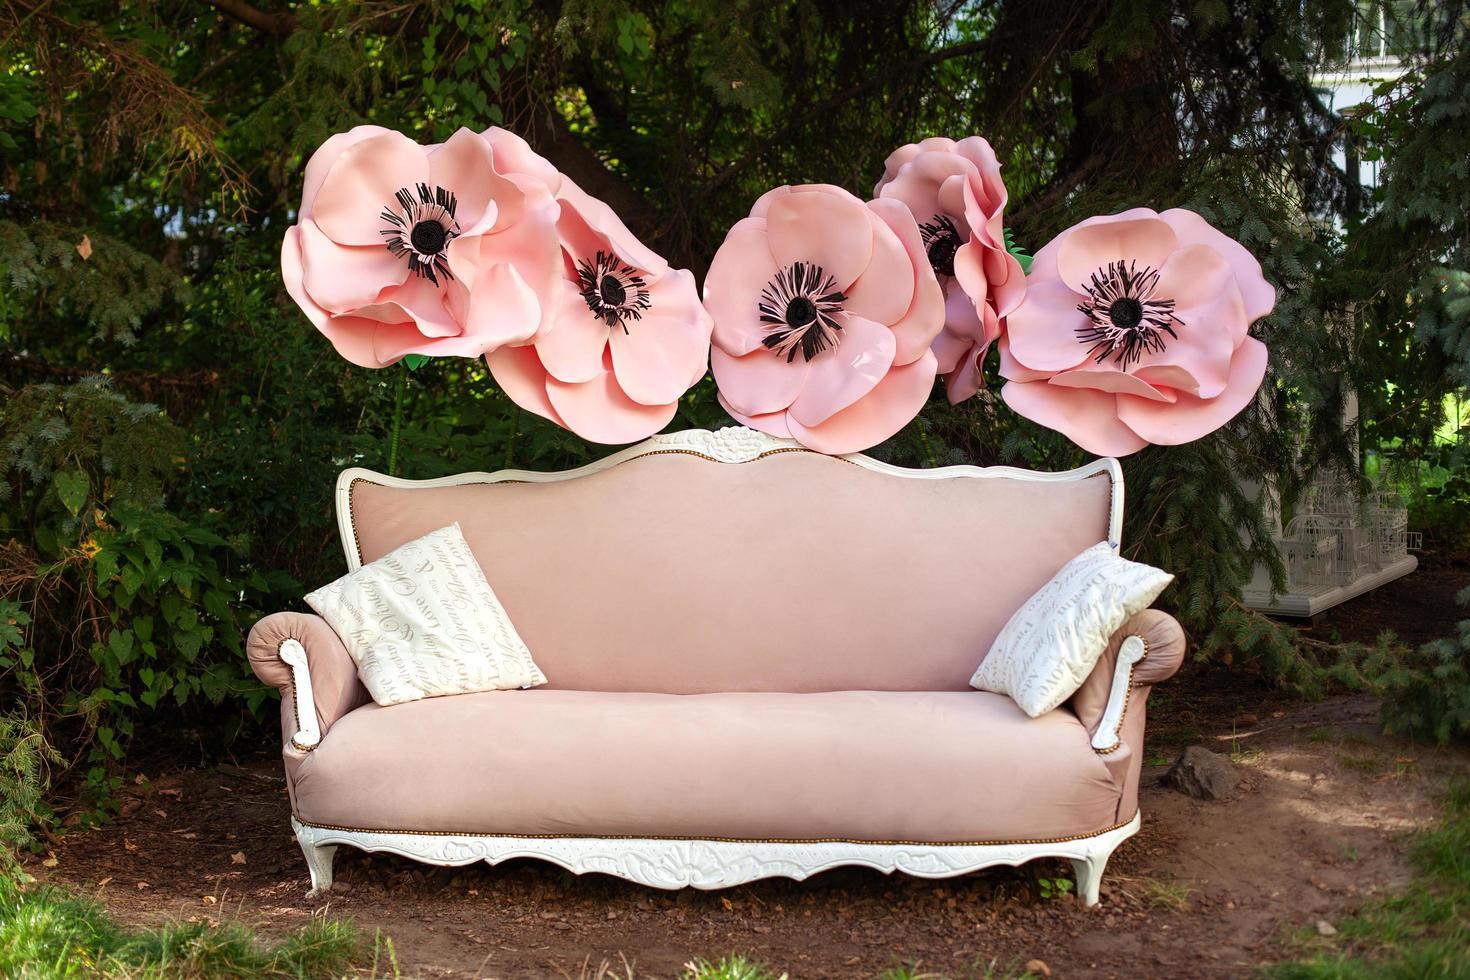 Garten Vintage rosa Sofa am Sommertag foto